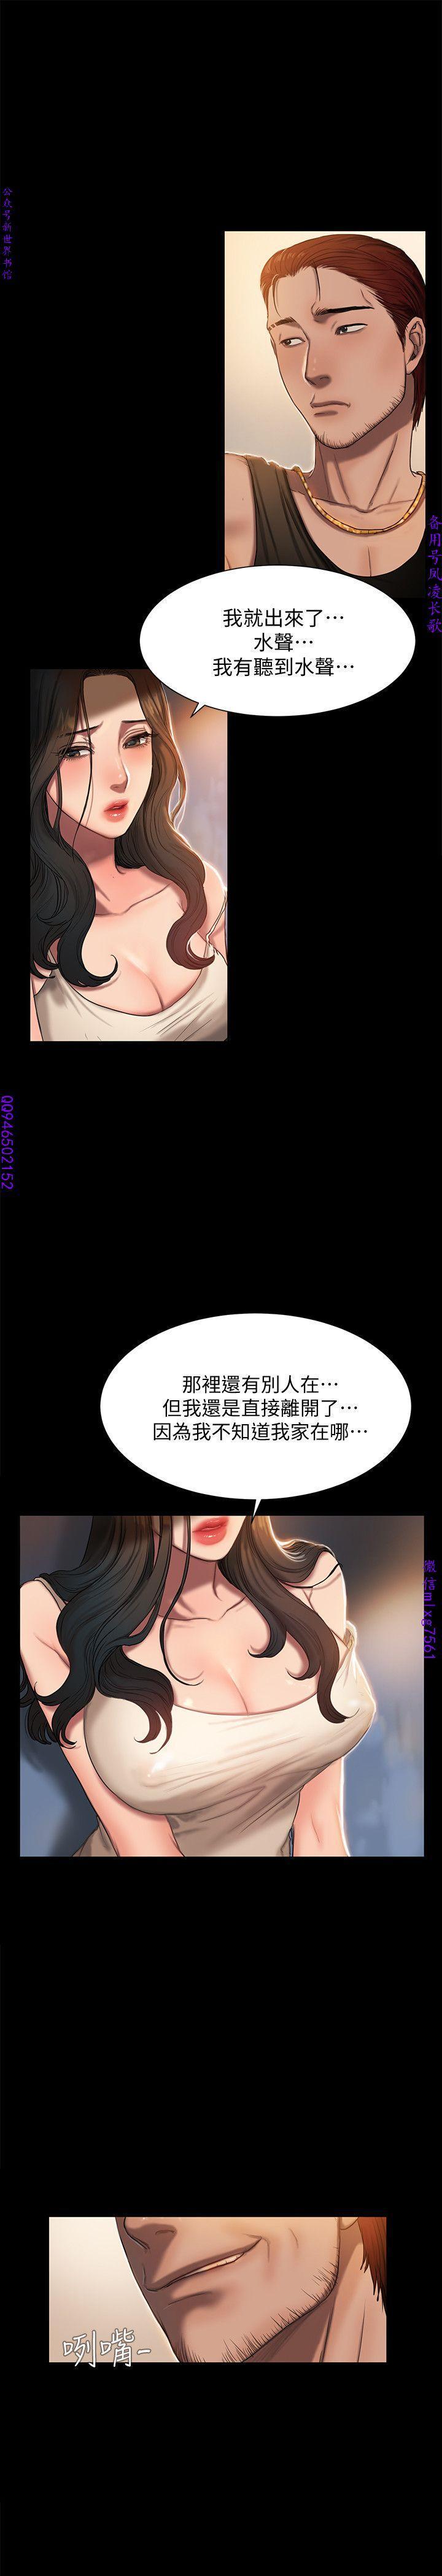 Run away 1-10【中文】 7